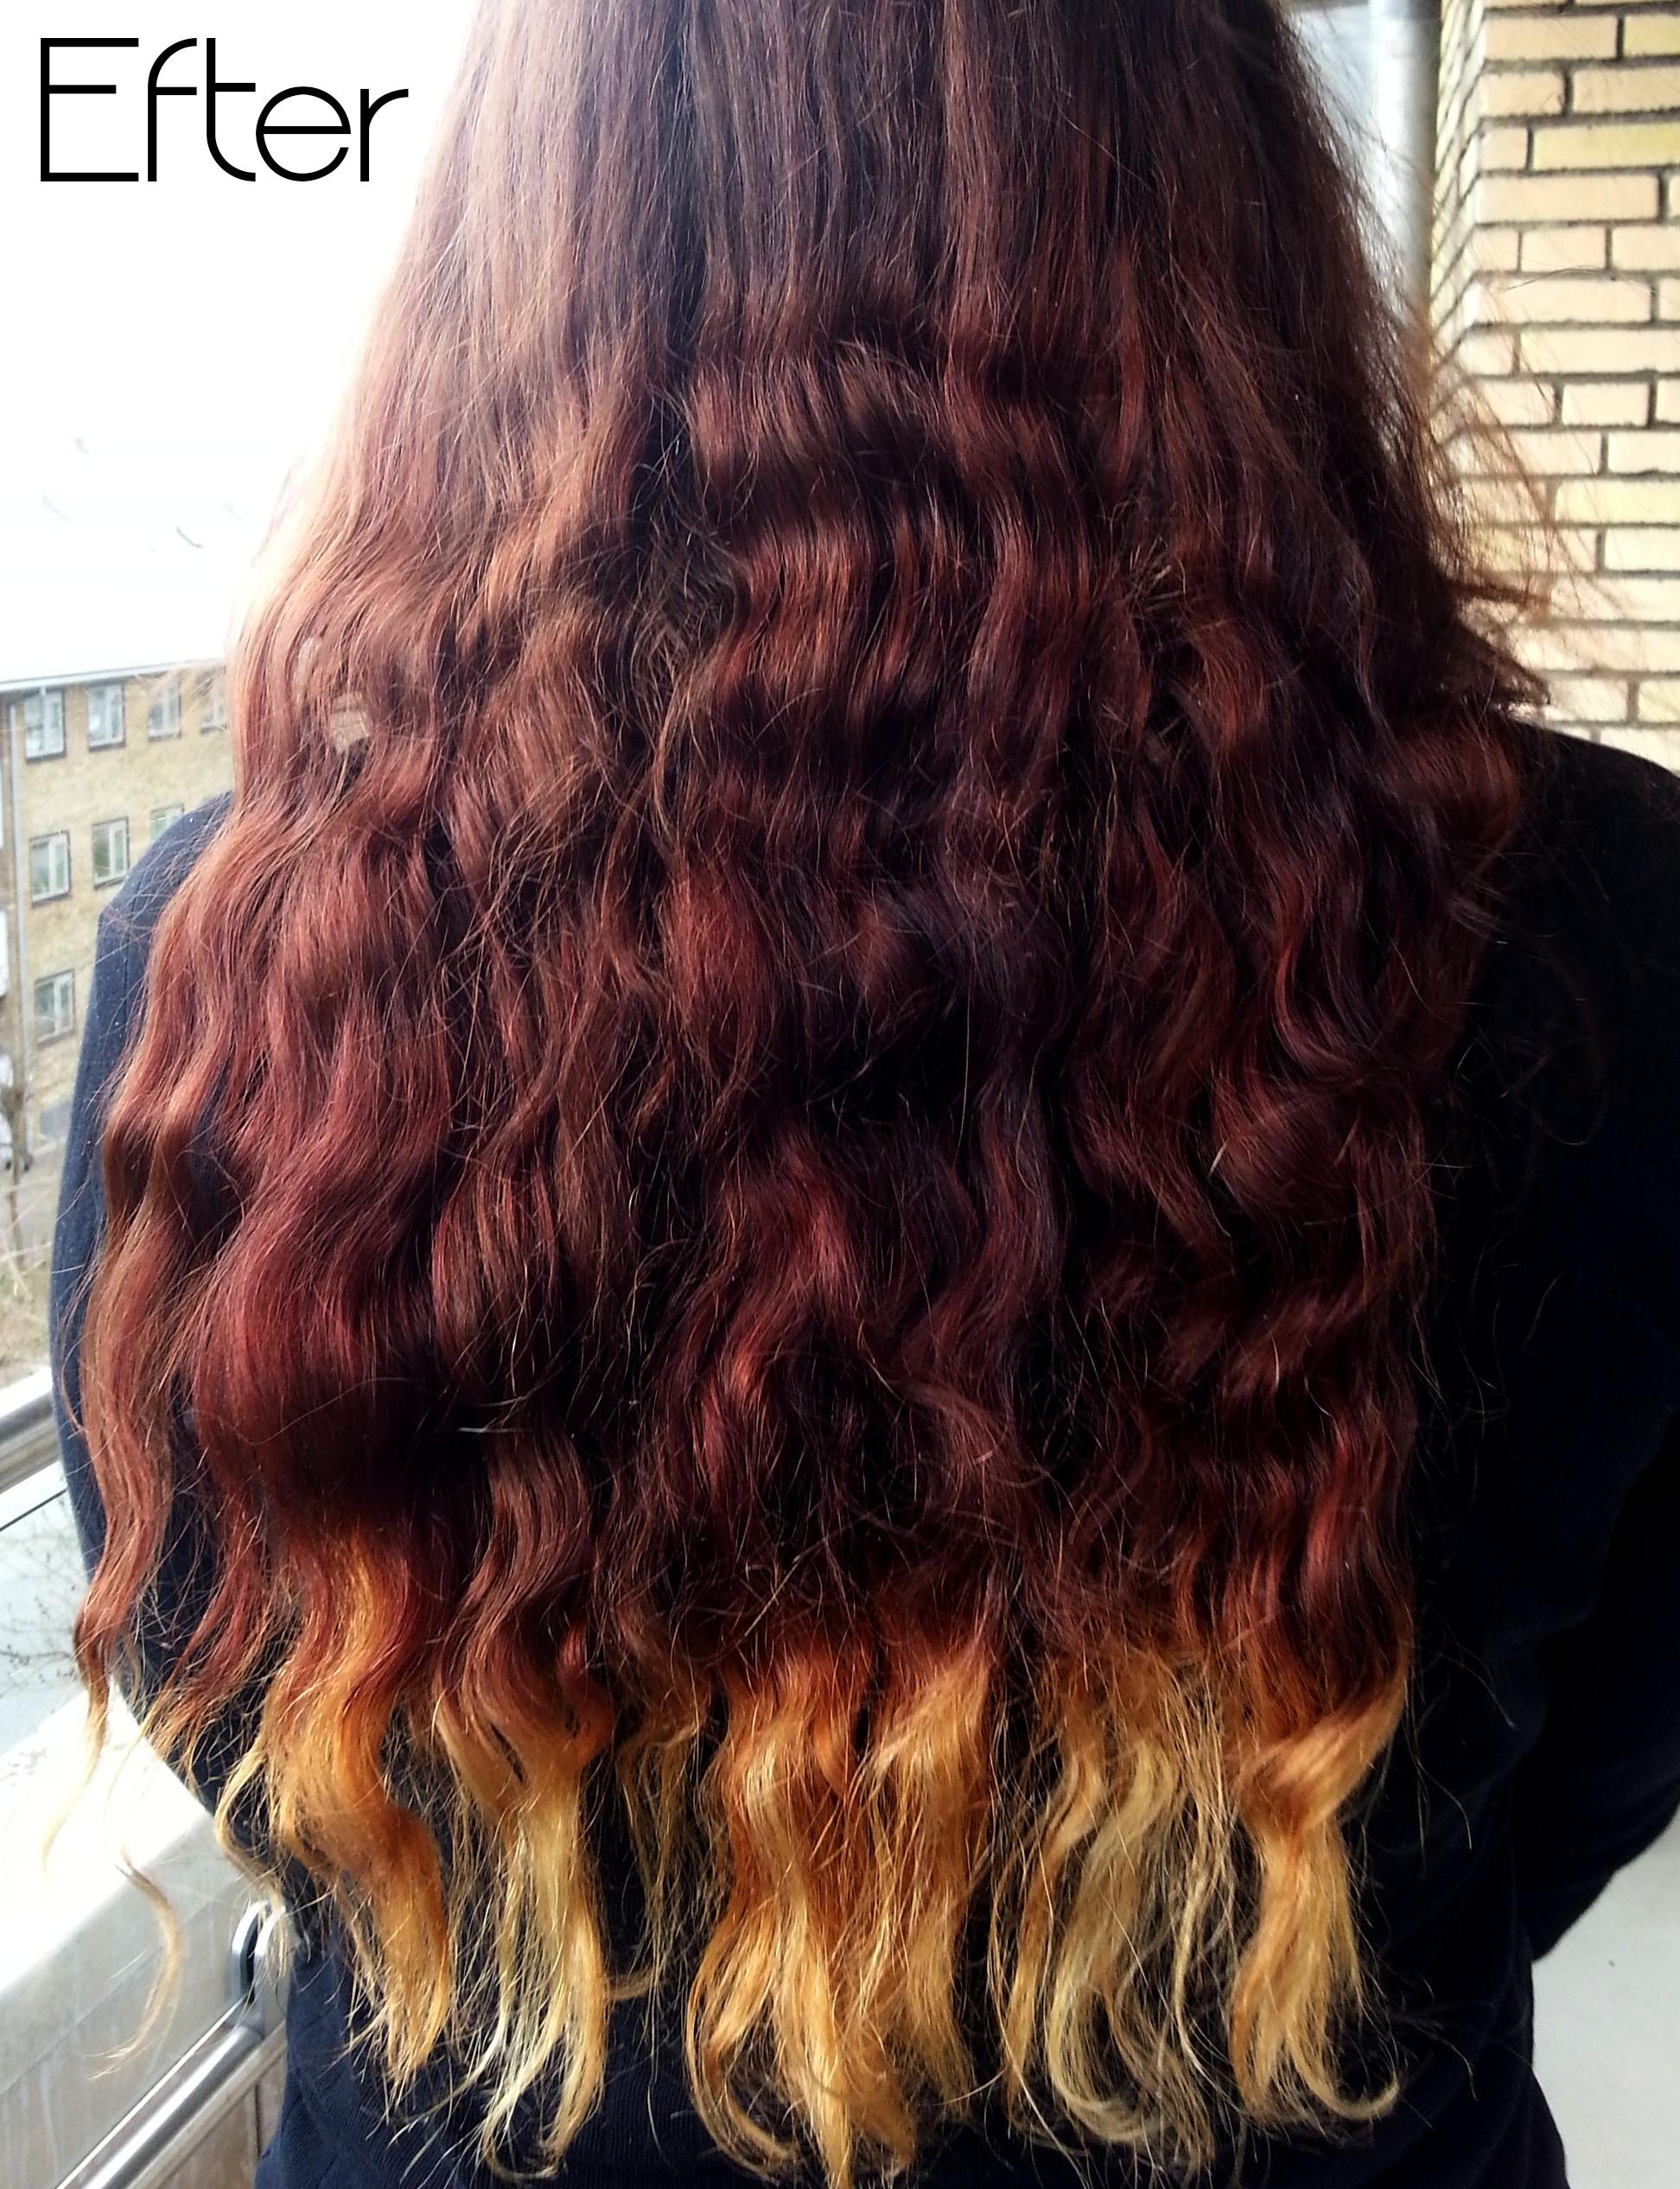 Dip Dye I Did It Artsy Fartsy Ombre Curly Hair Dip Dye Hair Curly Hair Styles